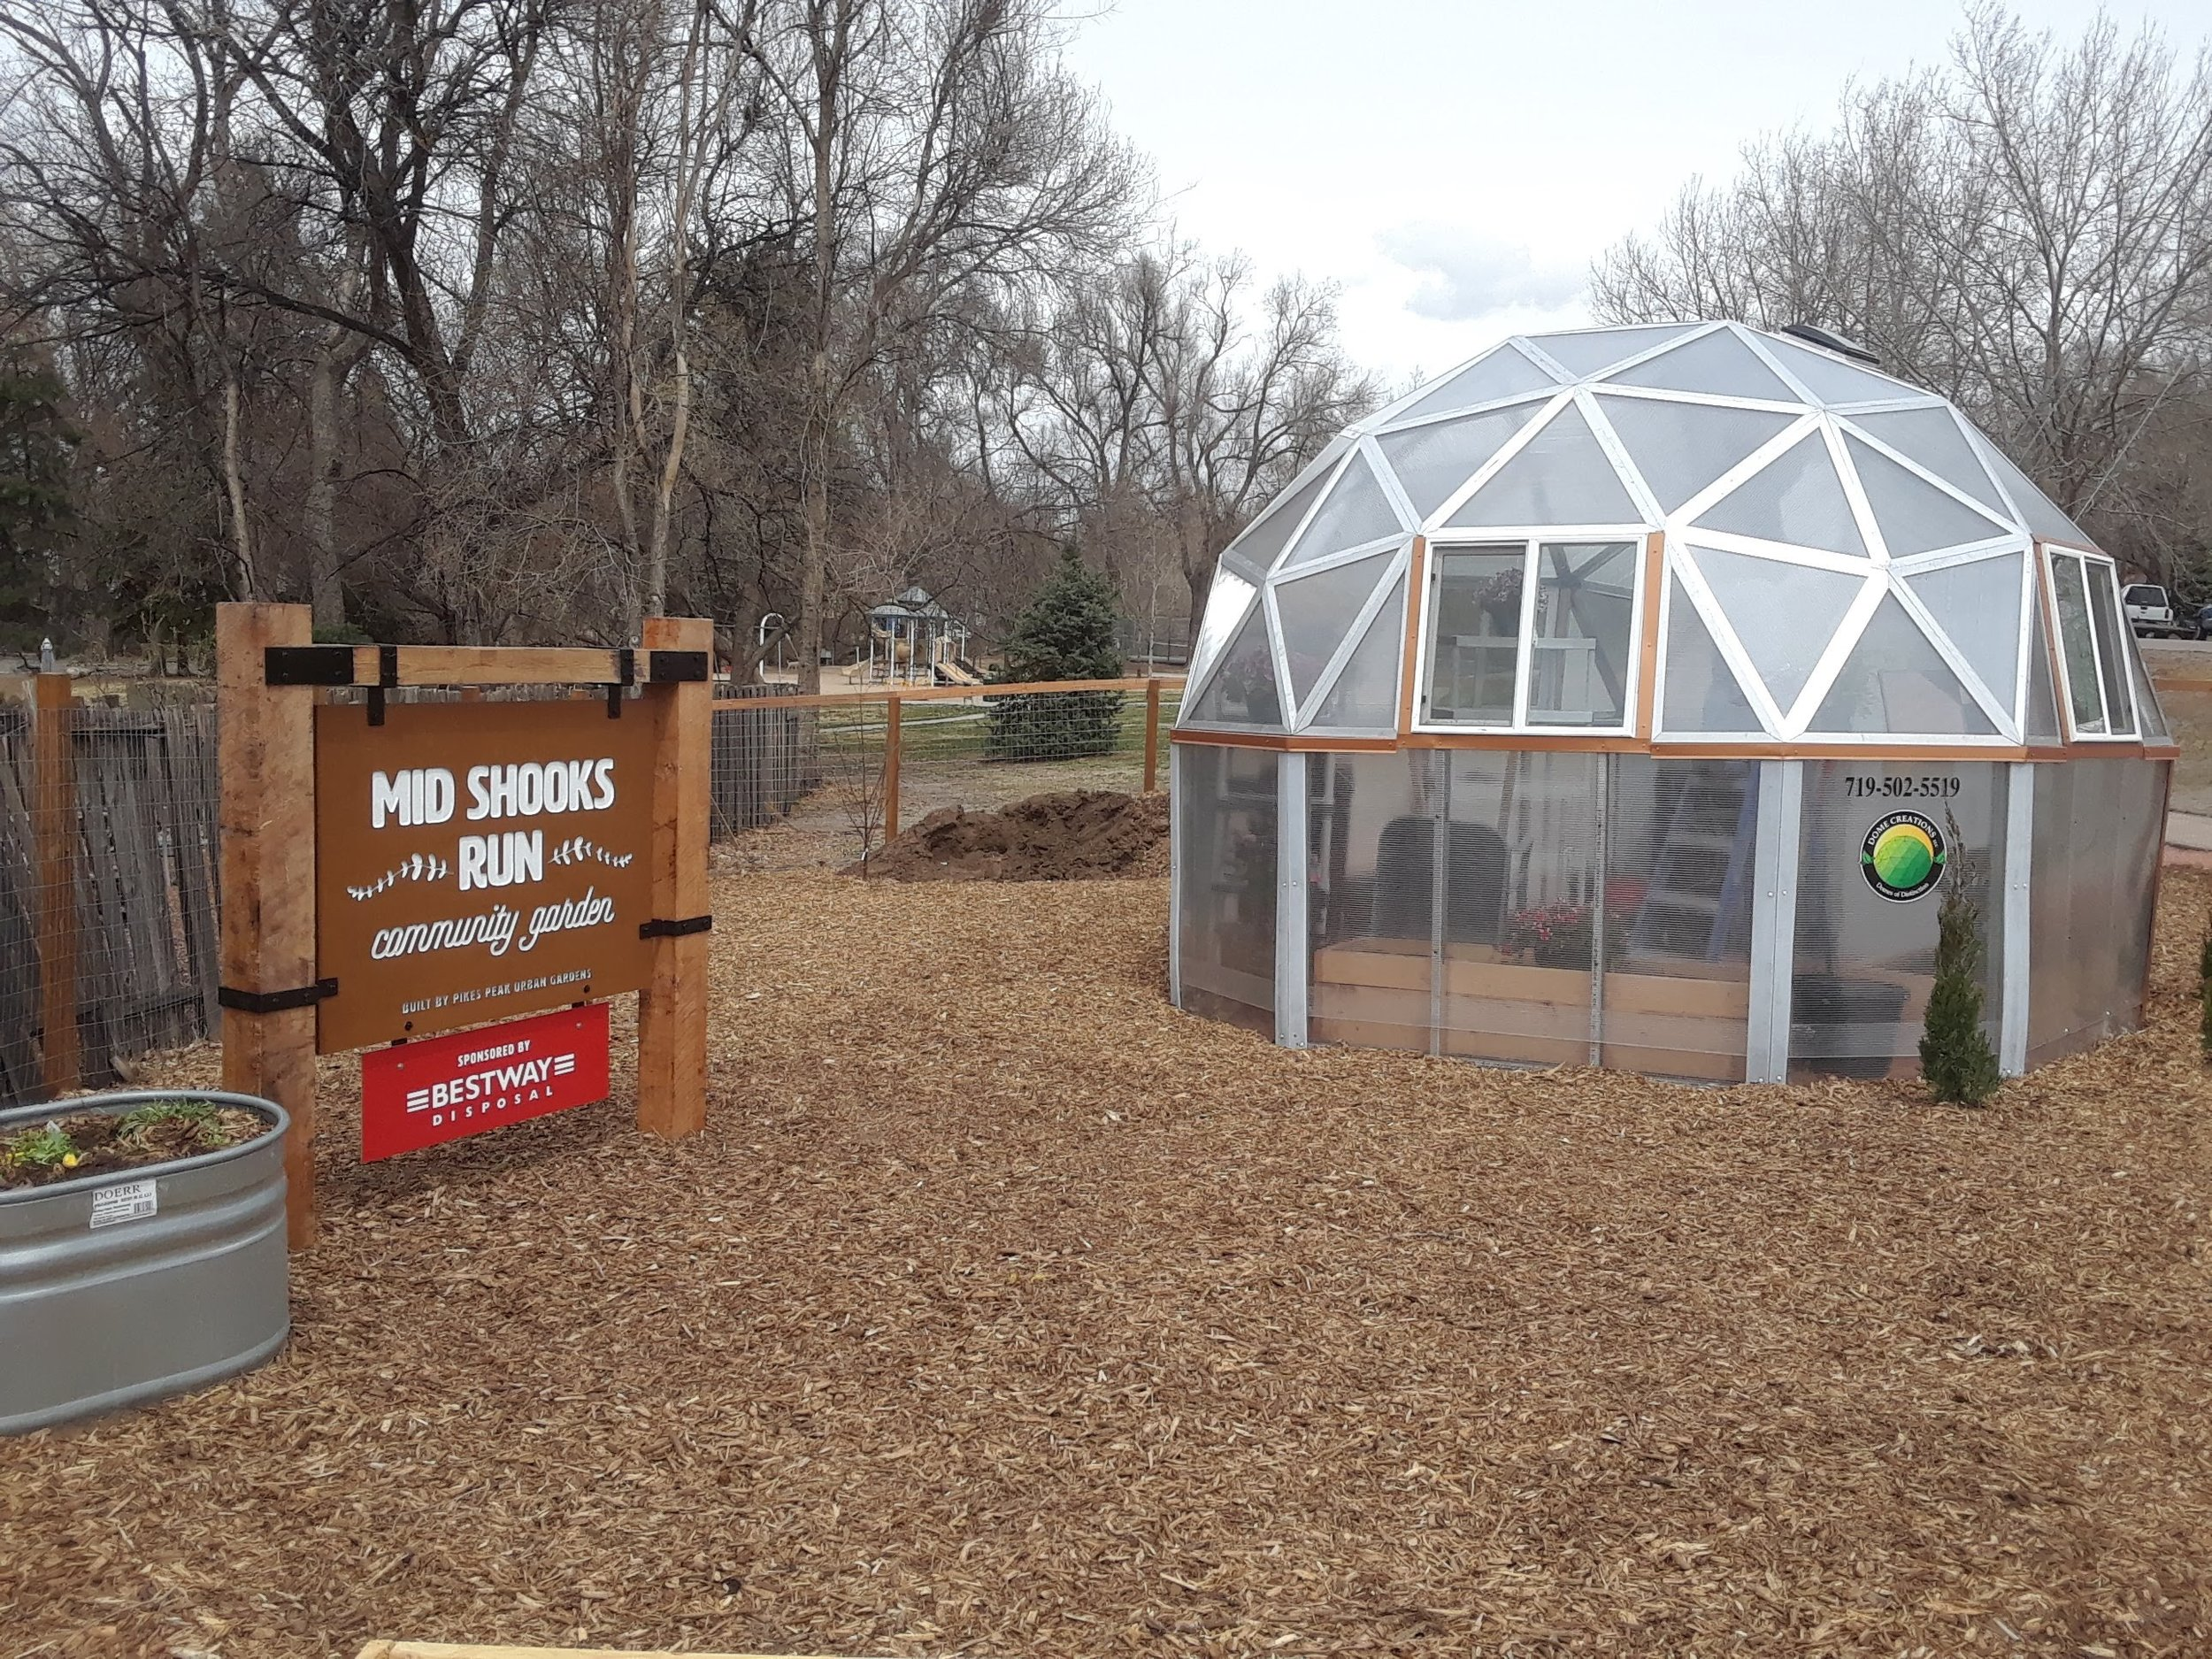 Geodesic dome at Mid Shooks Run Community Garden